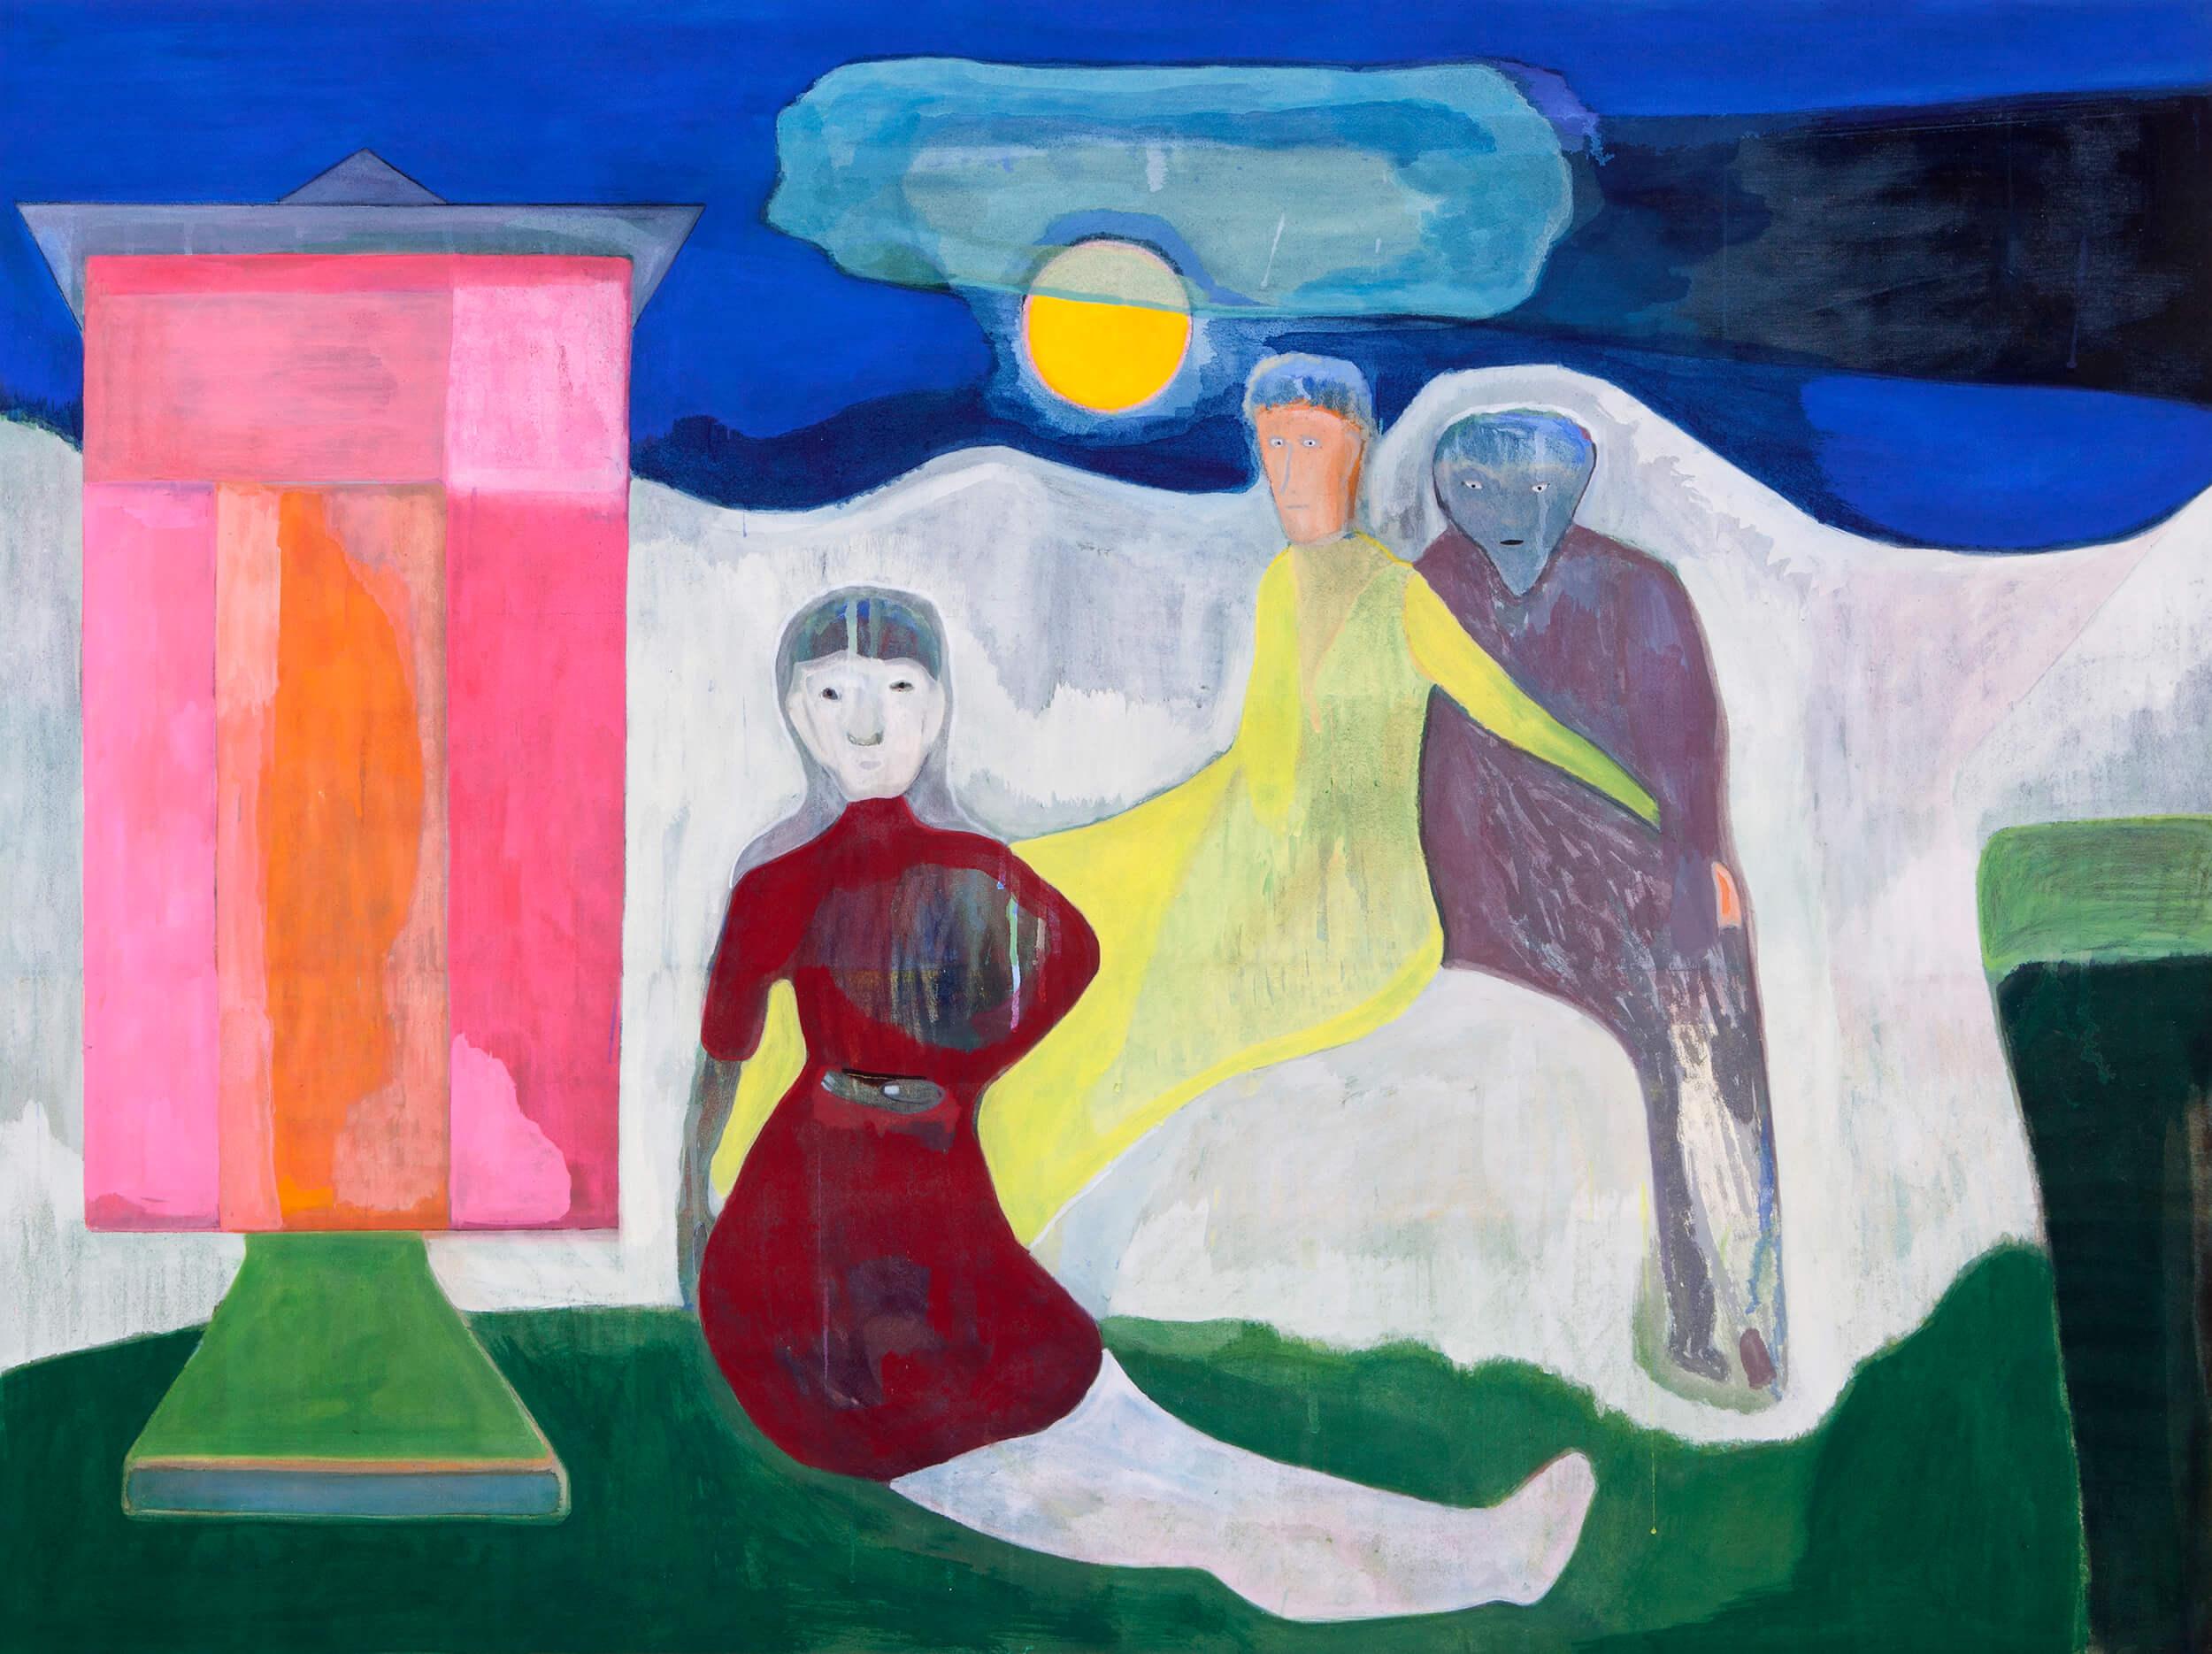 Vicente Matte Blue Night, 2021 distemper on canvas 47 1/4 x 63 in. (120 x 160 cm.)